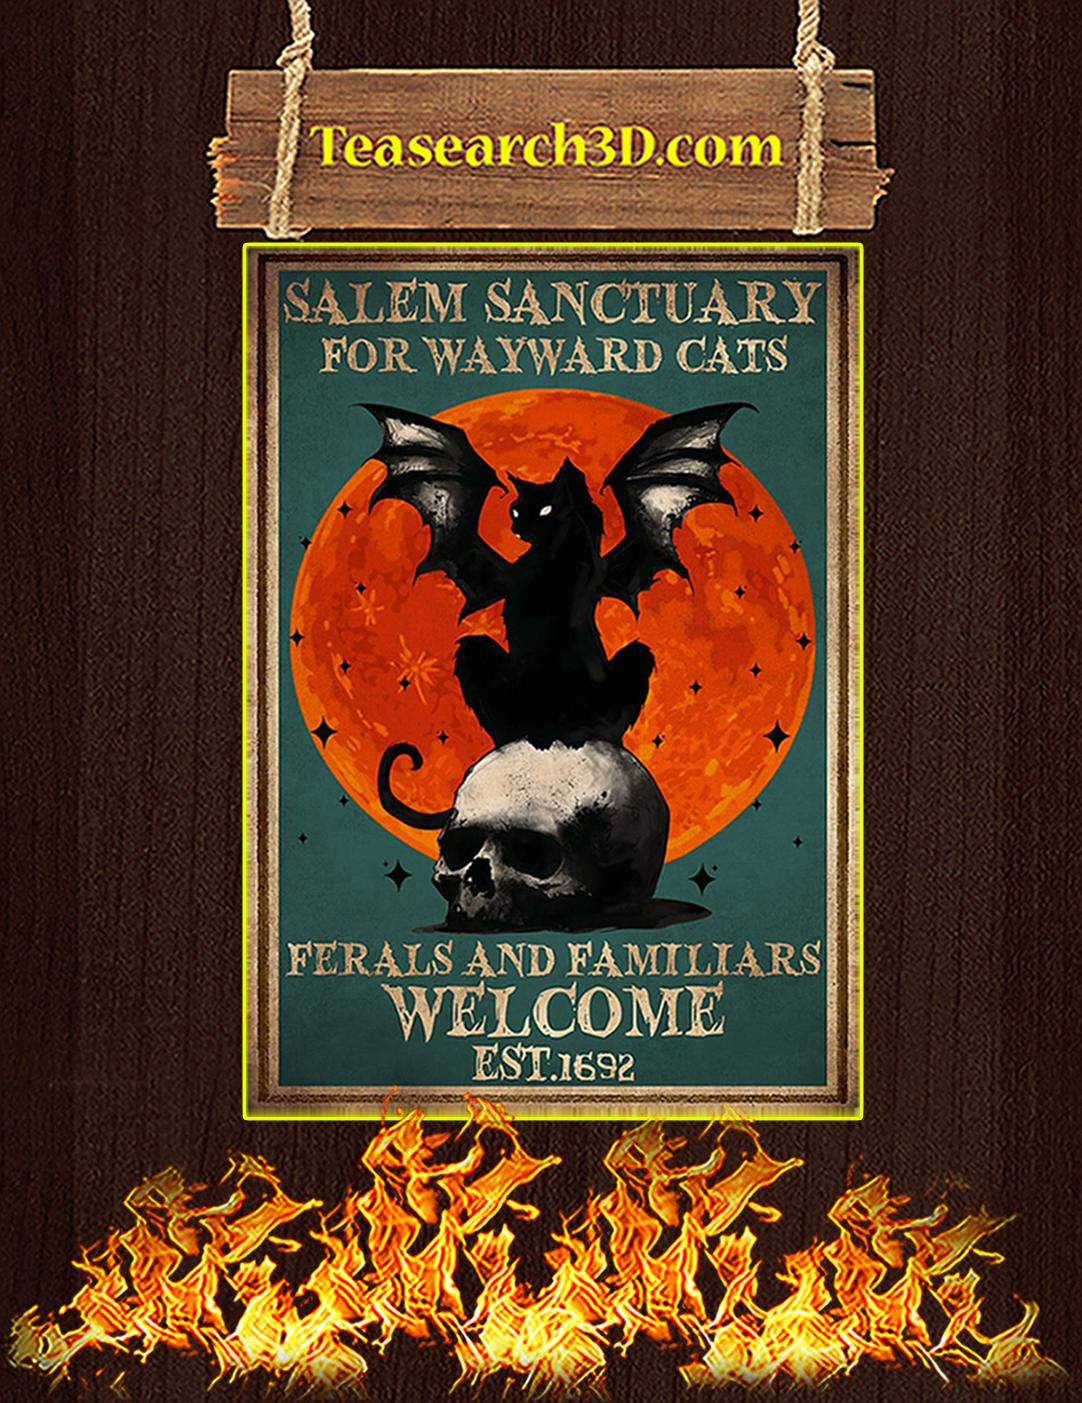 Salem sanctuary for wayward cats poster A2